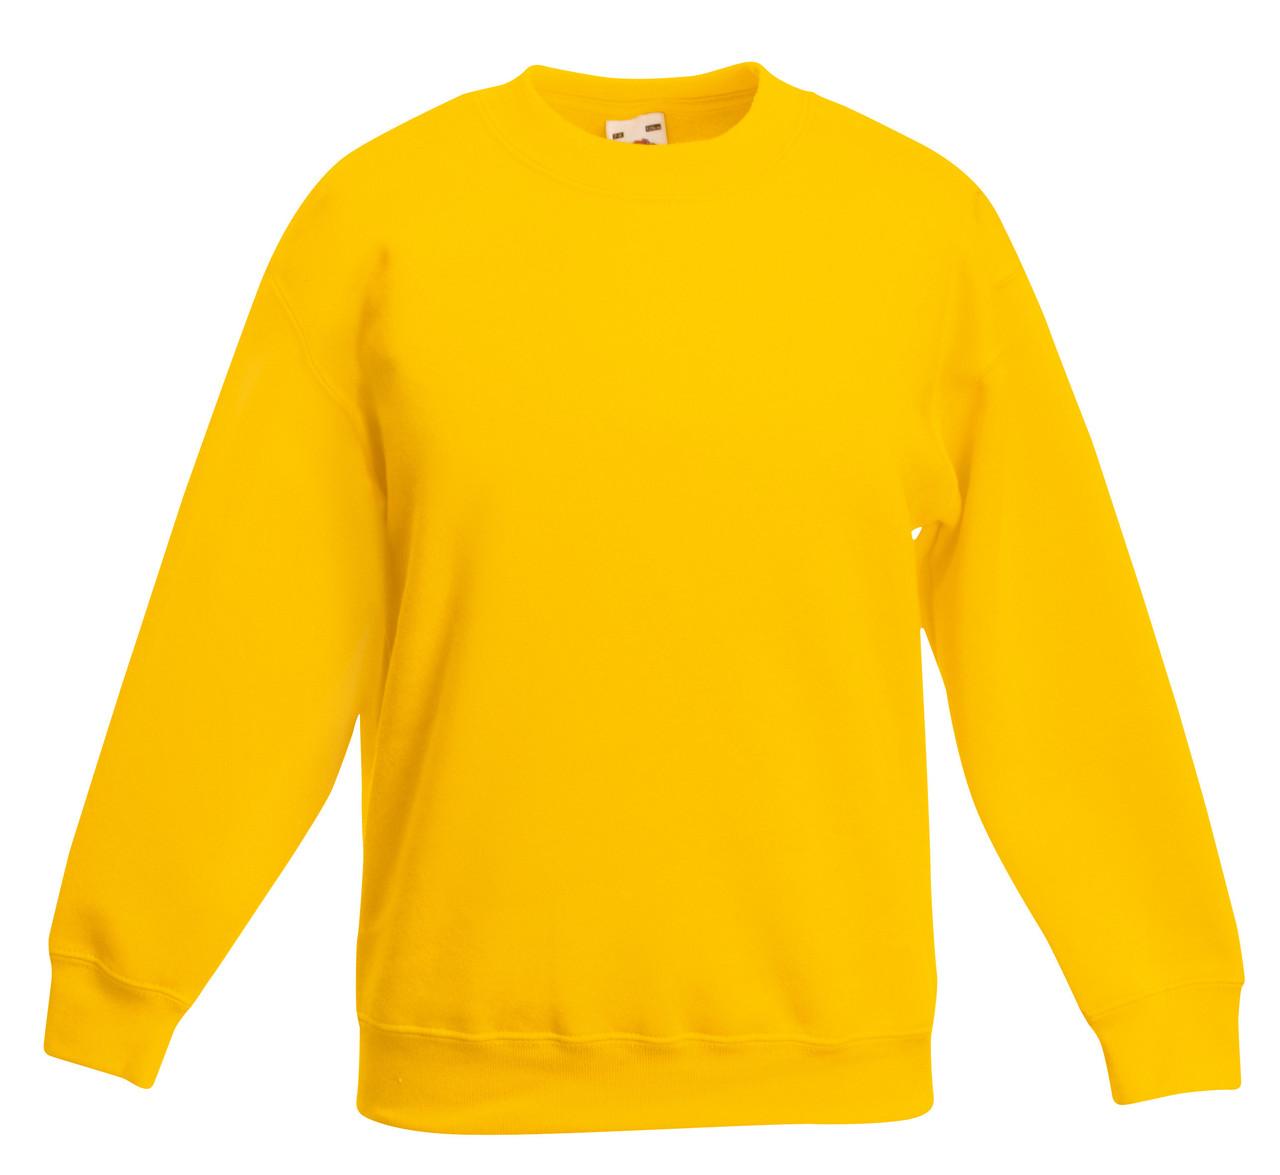 Детский классический свитер Солнечно-жёлтый Fruit Of The Loom  62-041-34 9-11